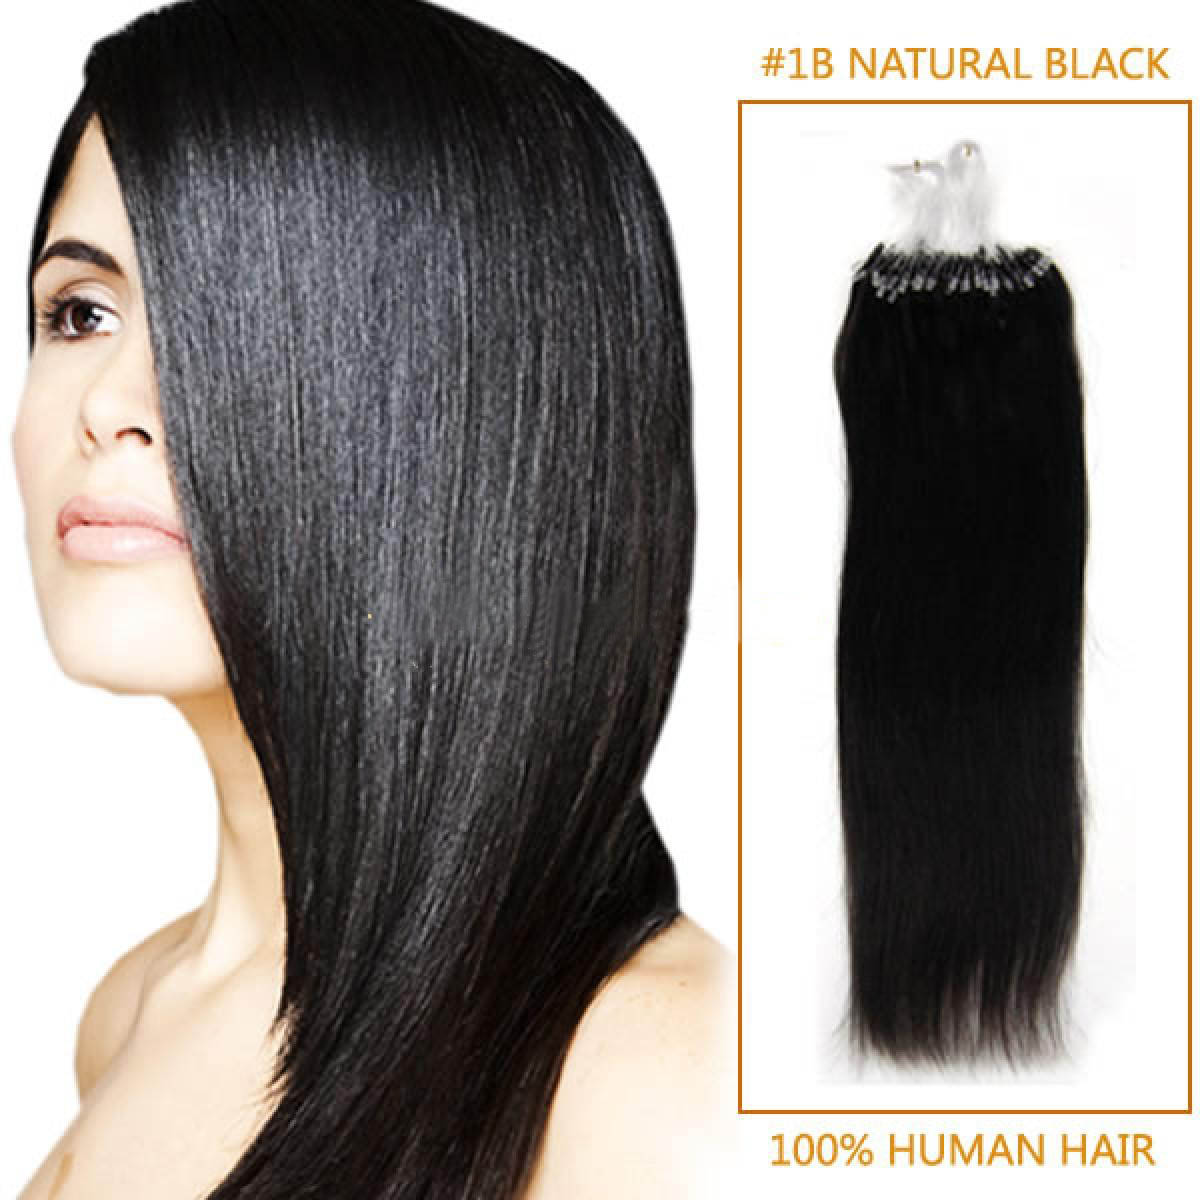 22 Inch 1b Natural Black Micro Loop Human Hair Extensions 100s